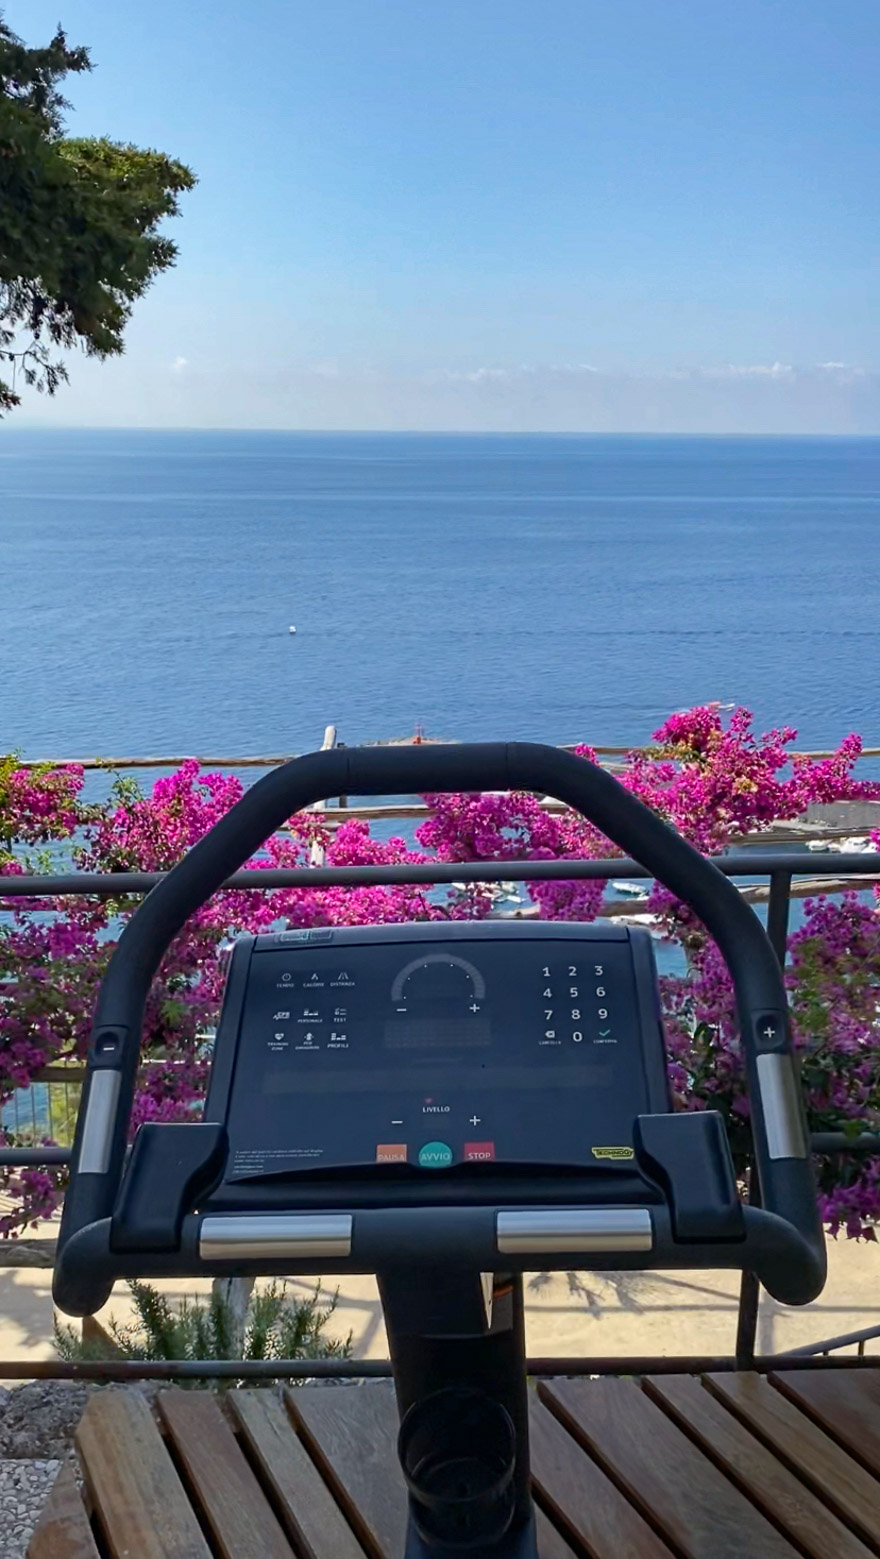 NH convento amalfi 91 - REVIEW - NH Collection Grand Hotel Convento di Amalfi : Junior Suite with Tatami bed [COVID-era]